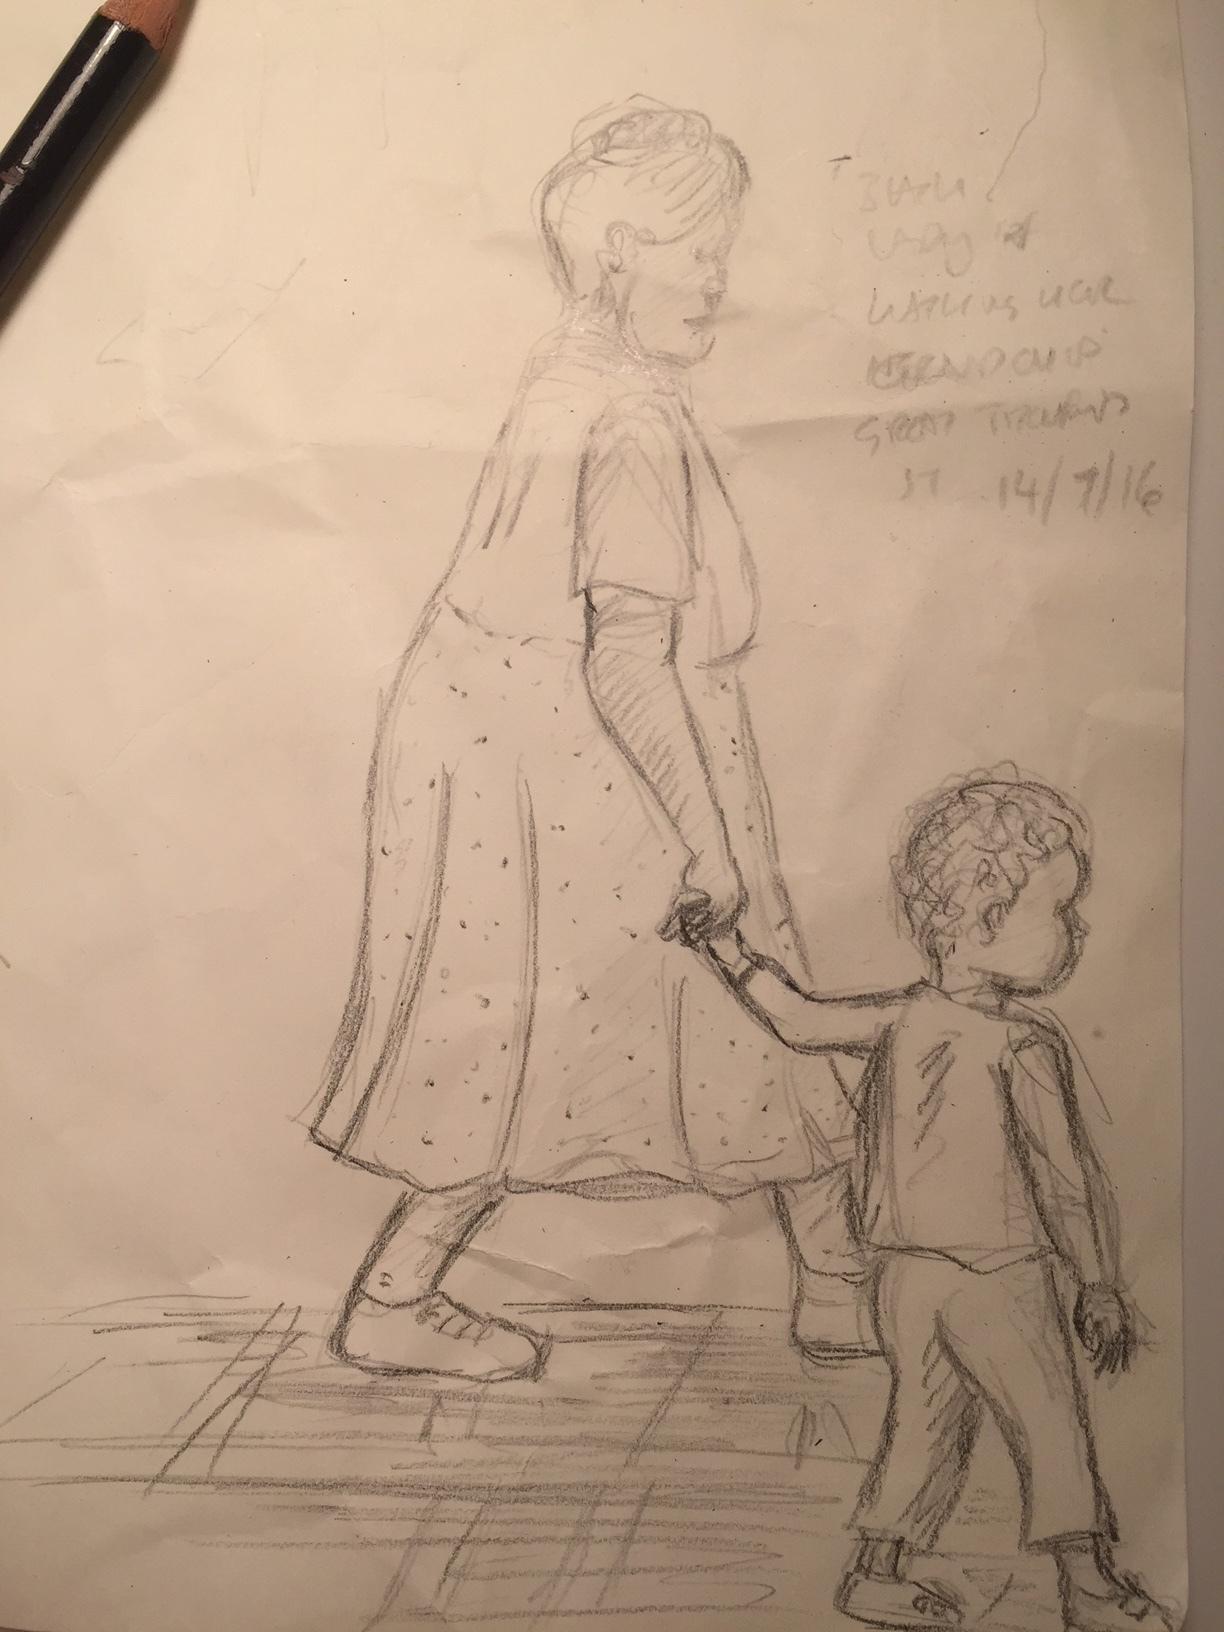 Grandma walking her grandson to school